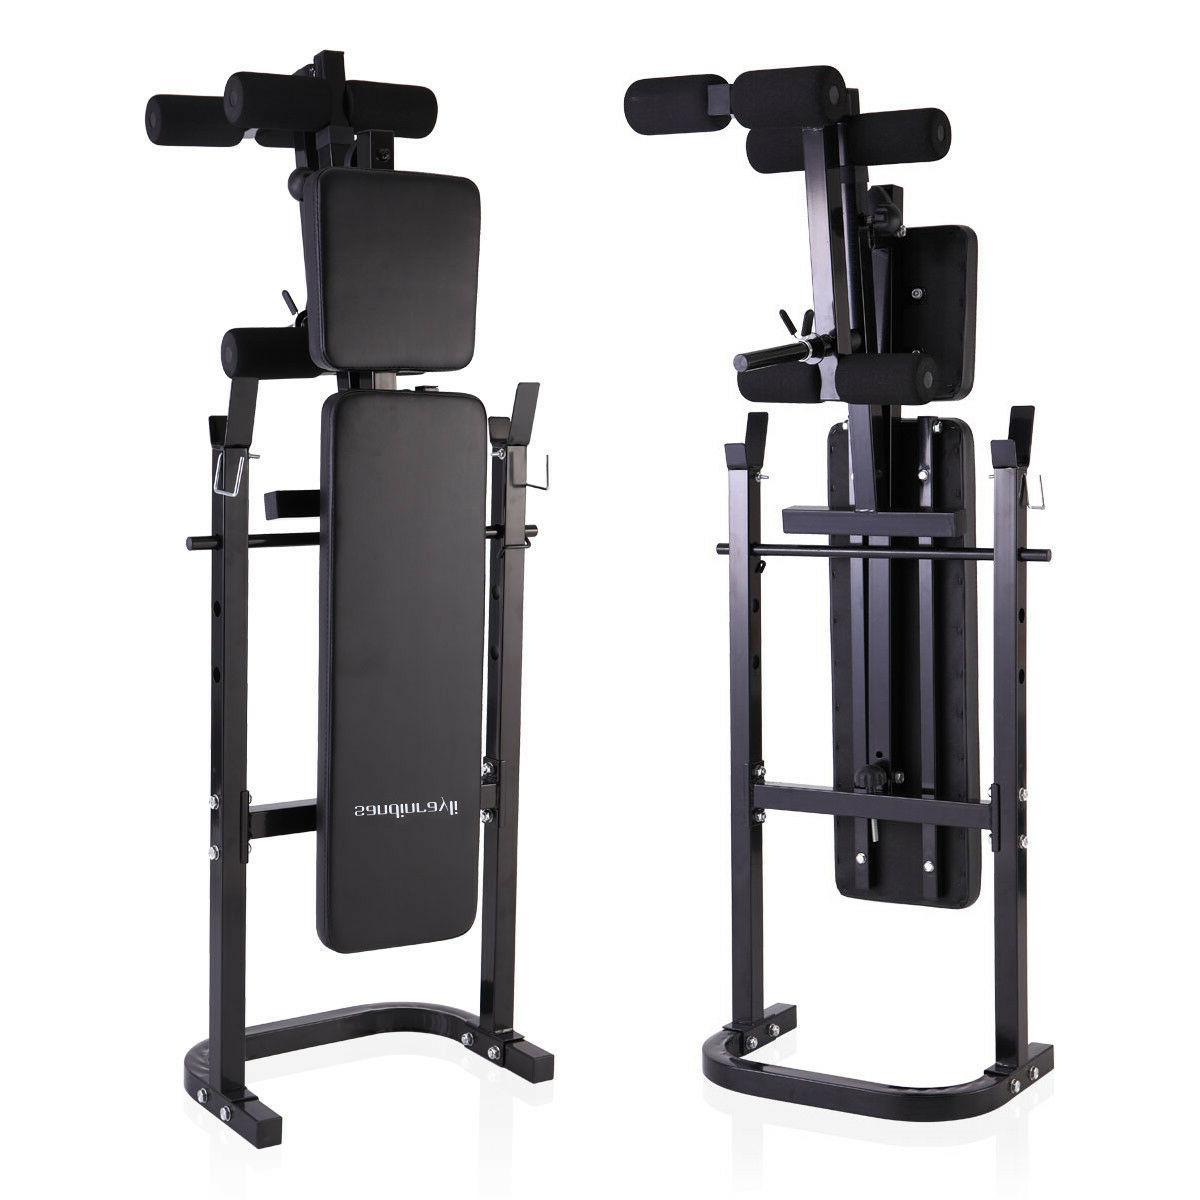 Weight Lifting w/Rack Adjustable Strength